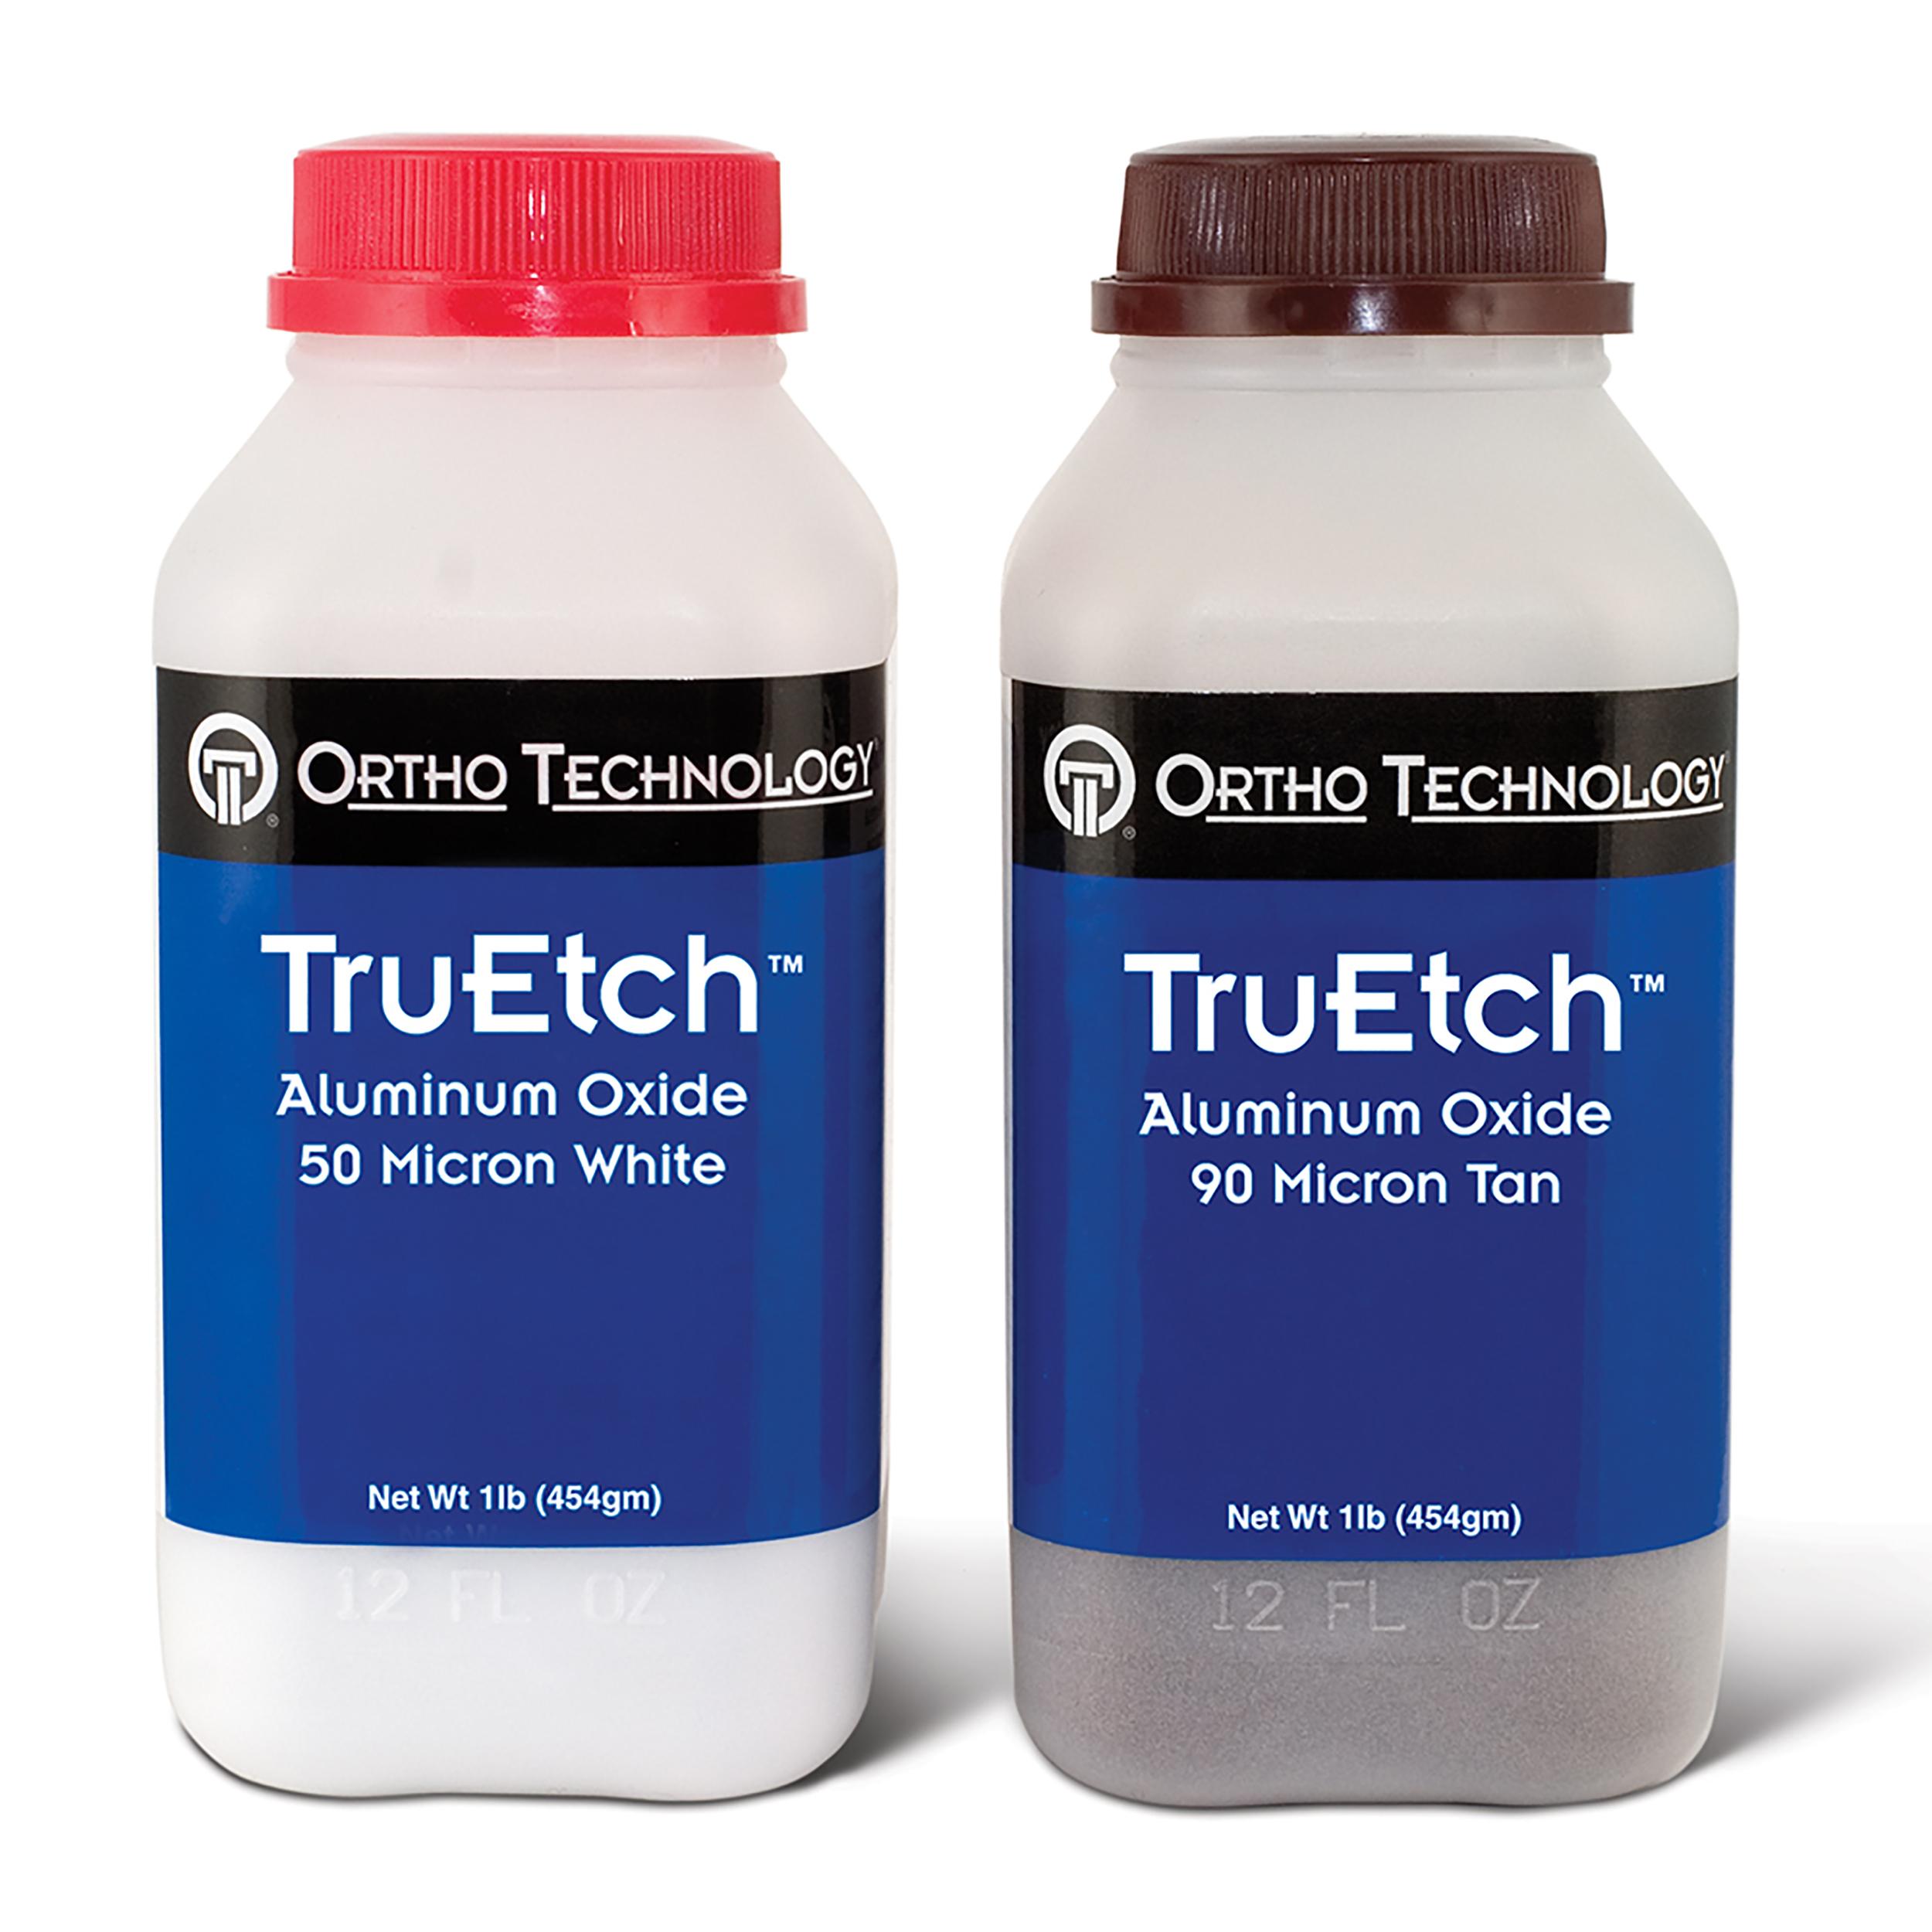 0926116 TruEtch Aluminum Oxide 50 Micron, White, 1 lb.